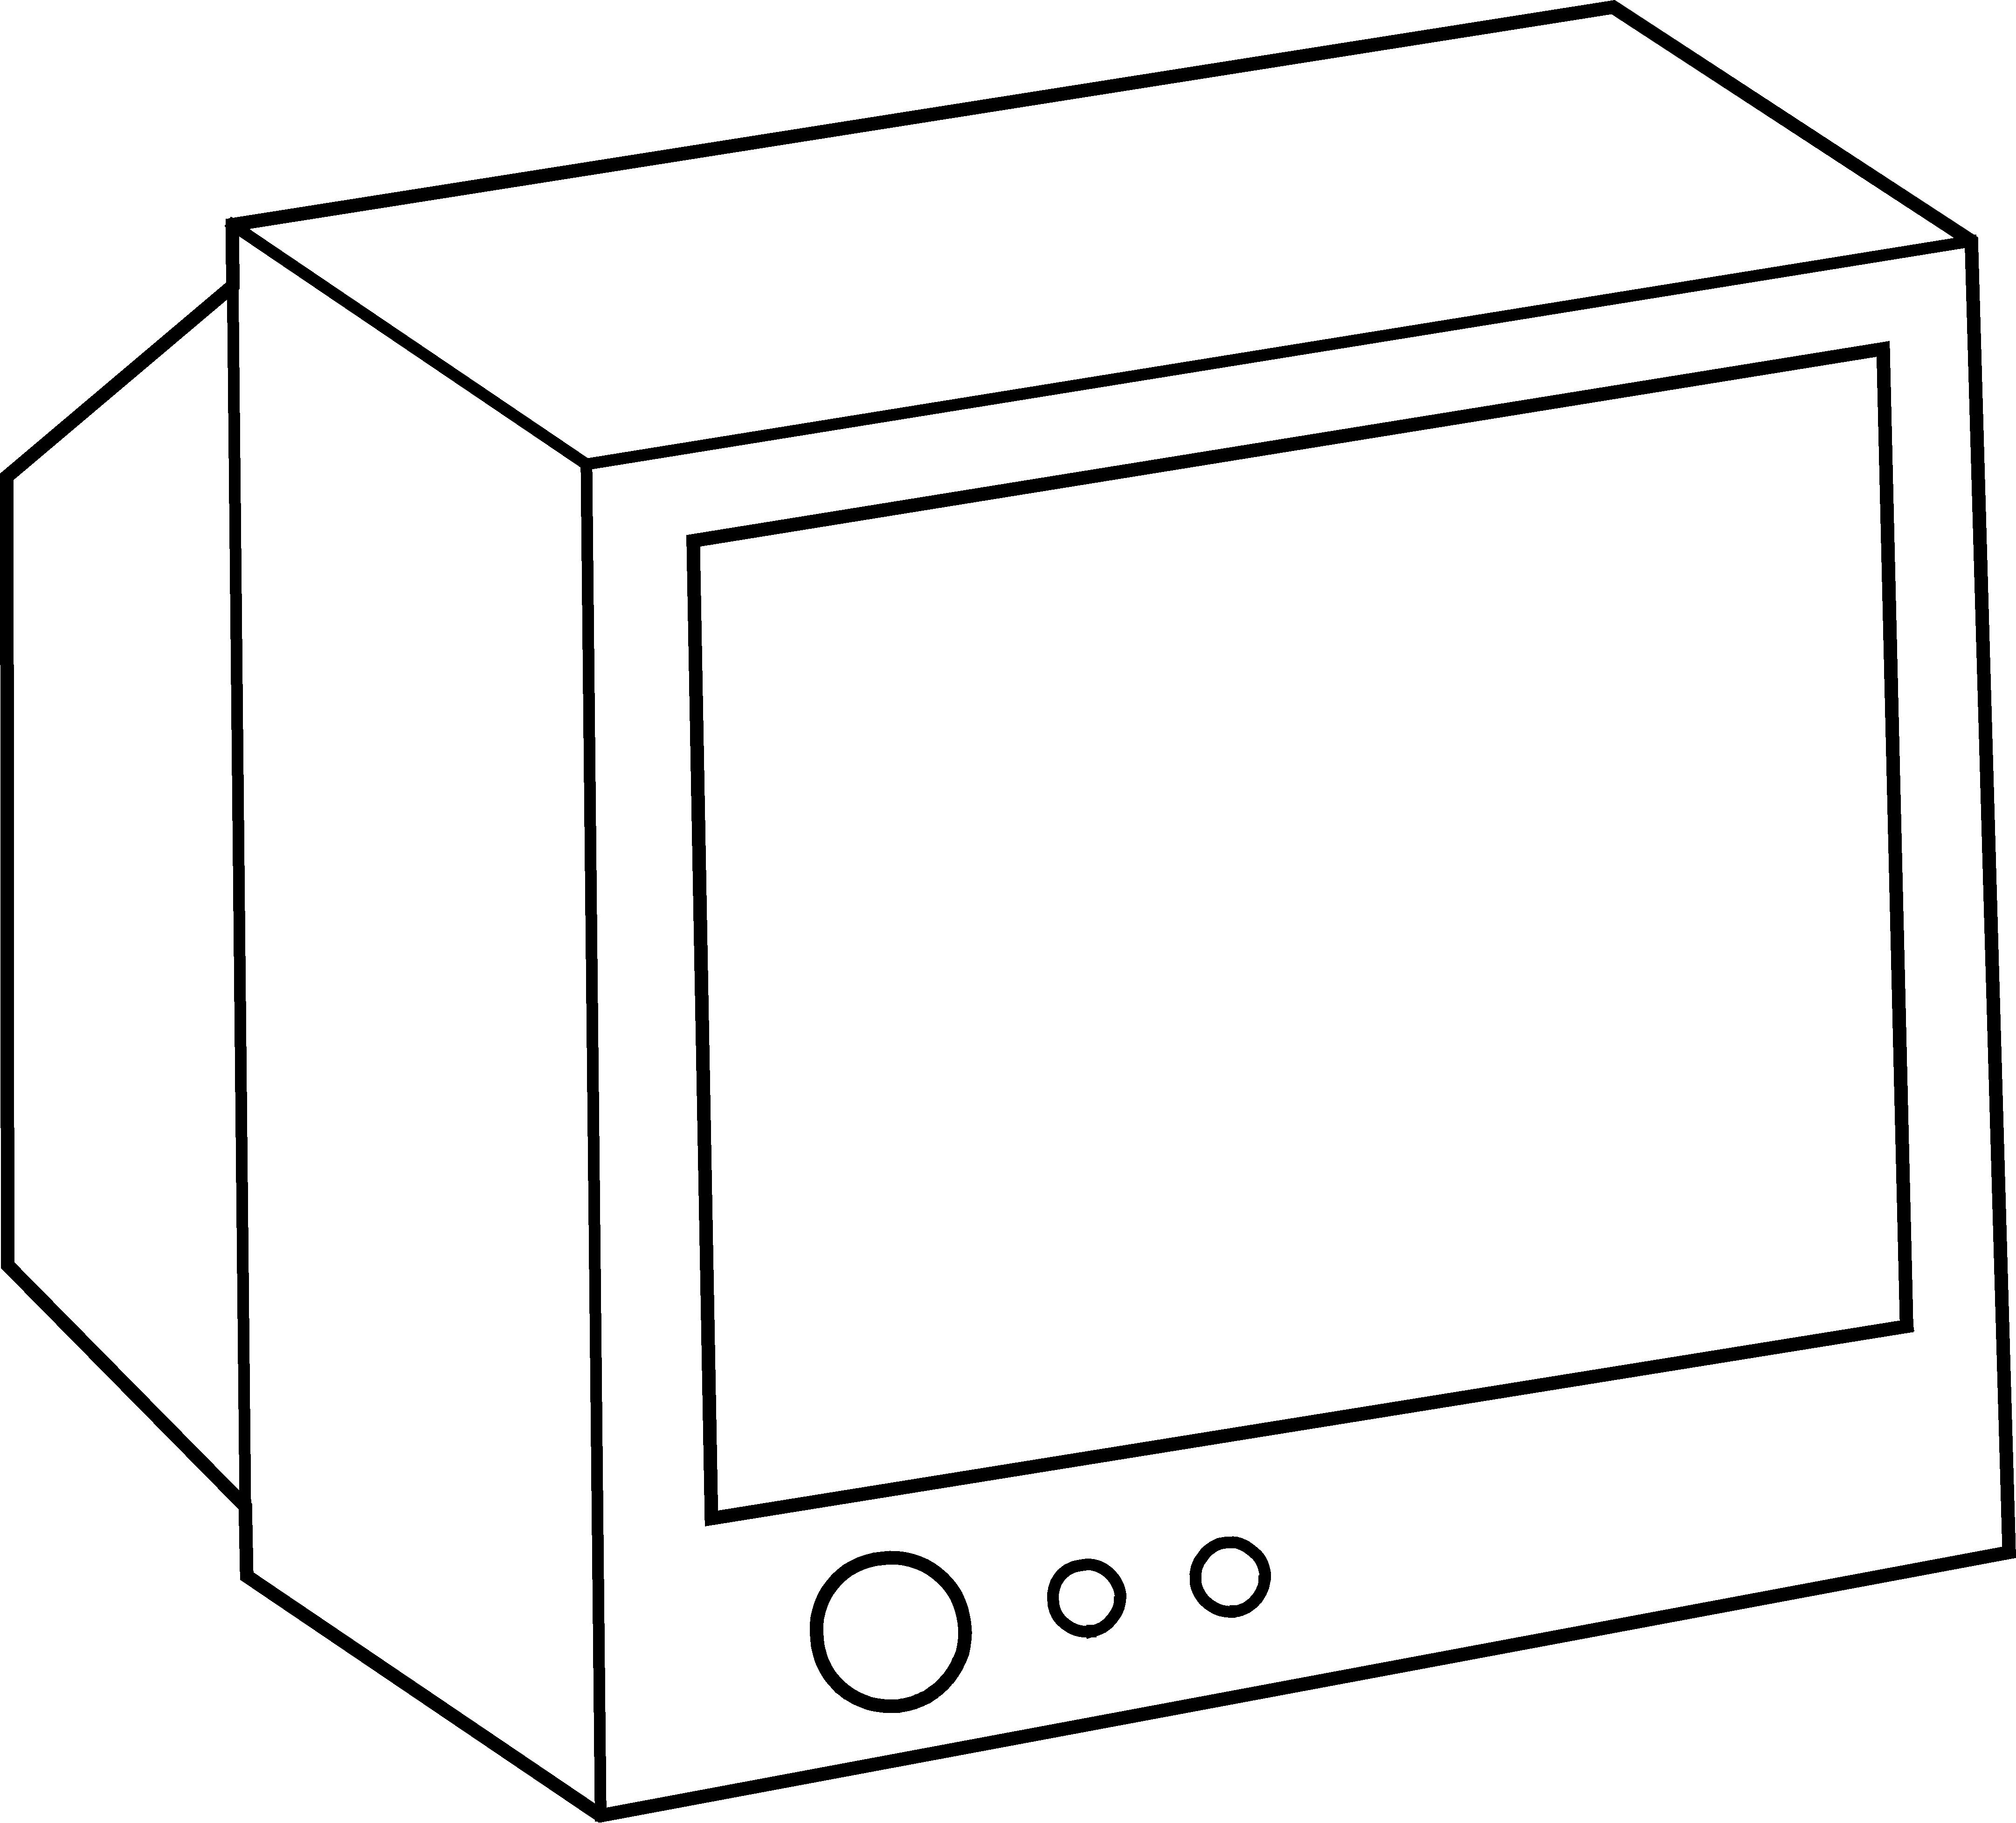 Tv Screen Clipart Black And White | Clipart Panda - Free ...